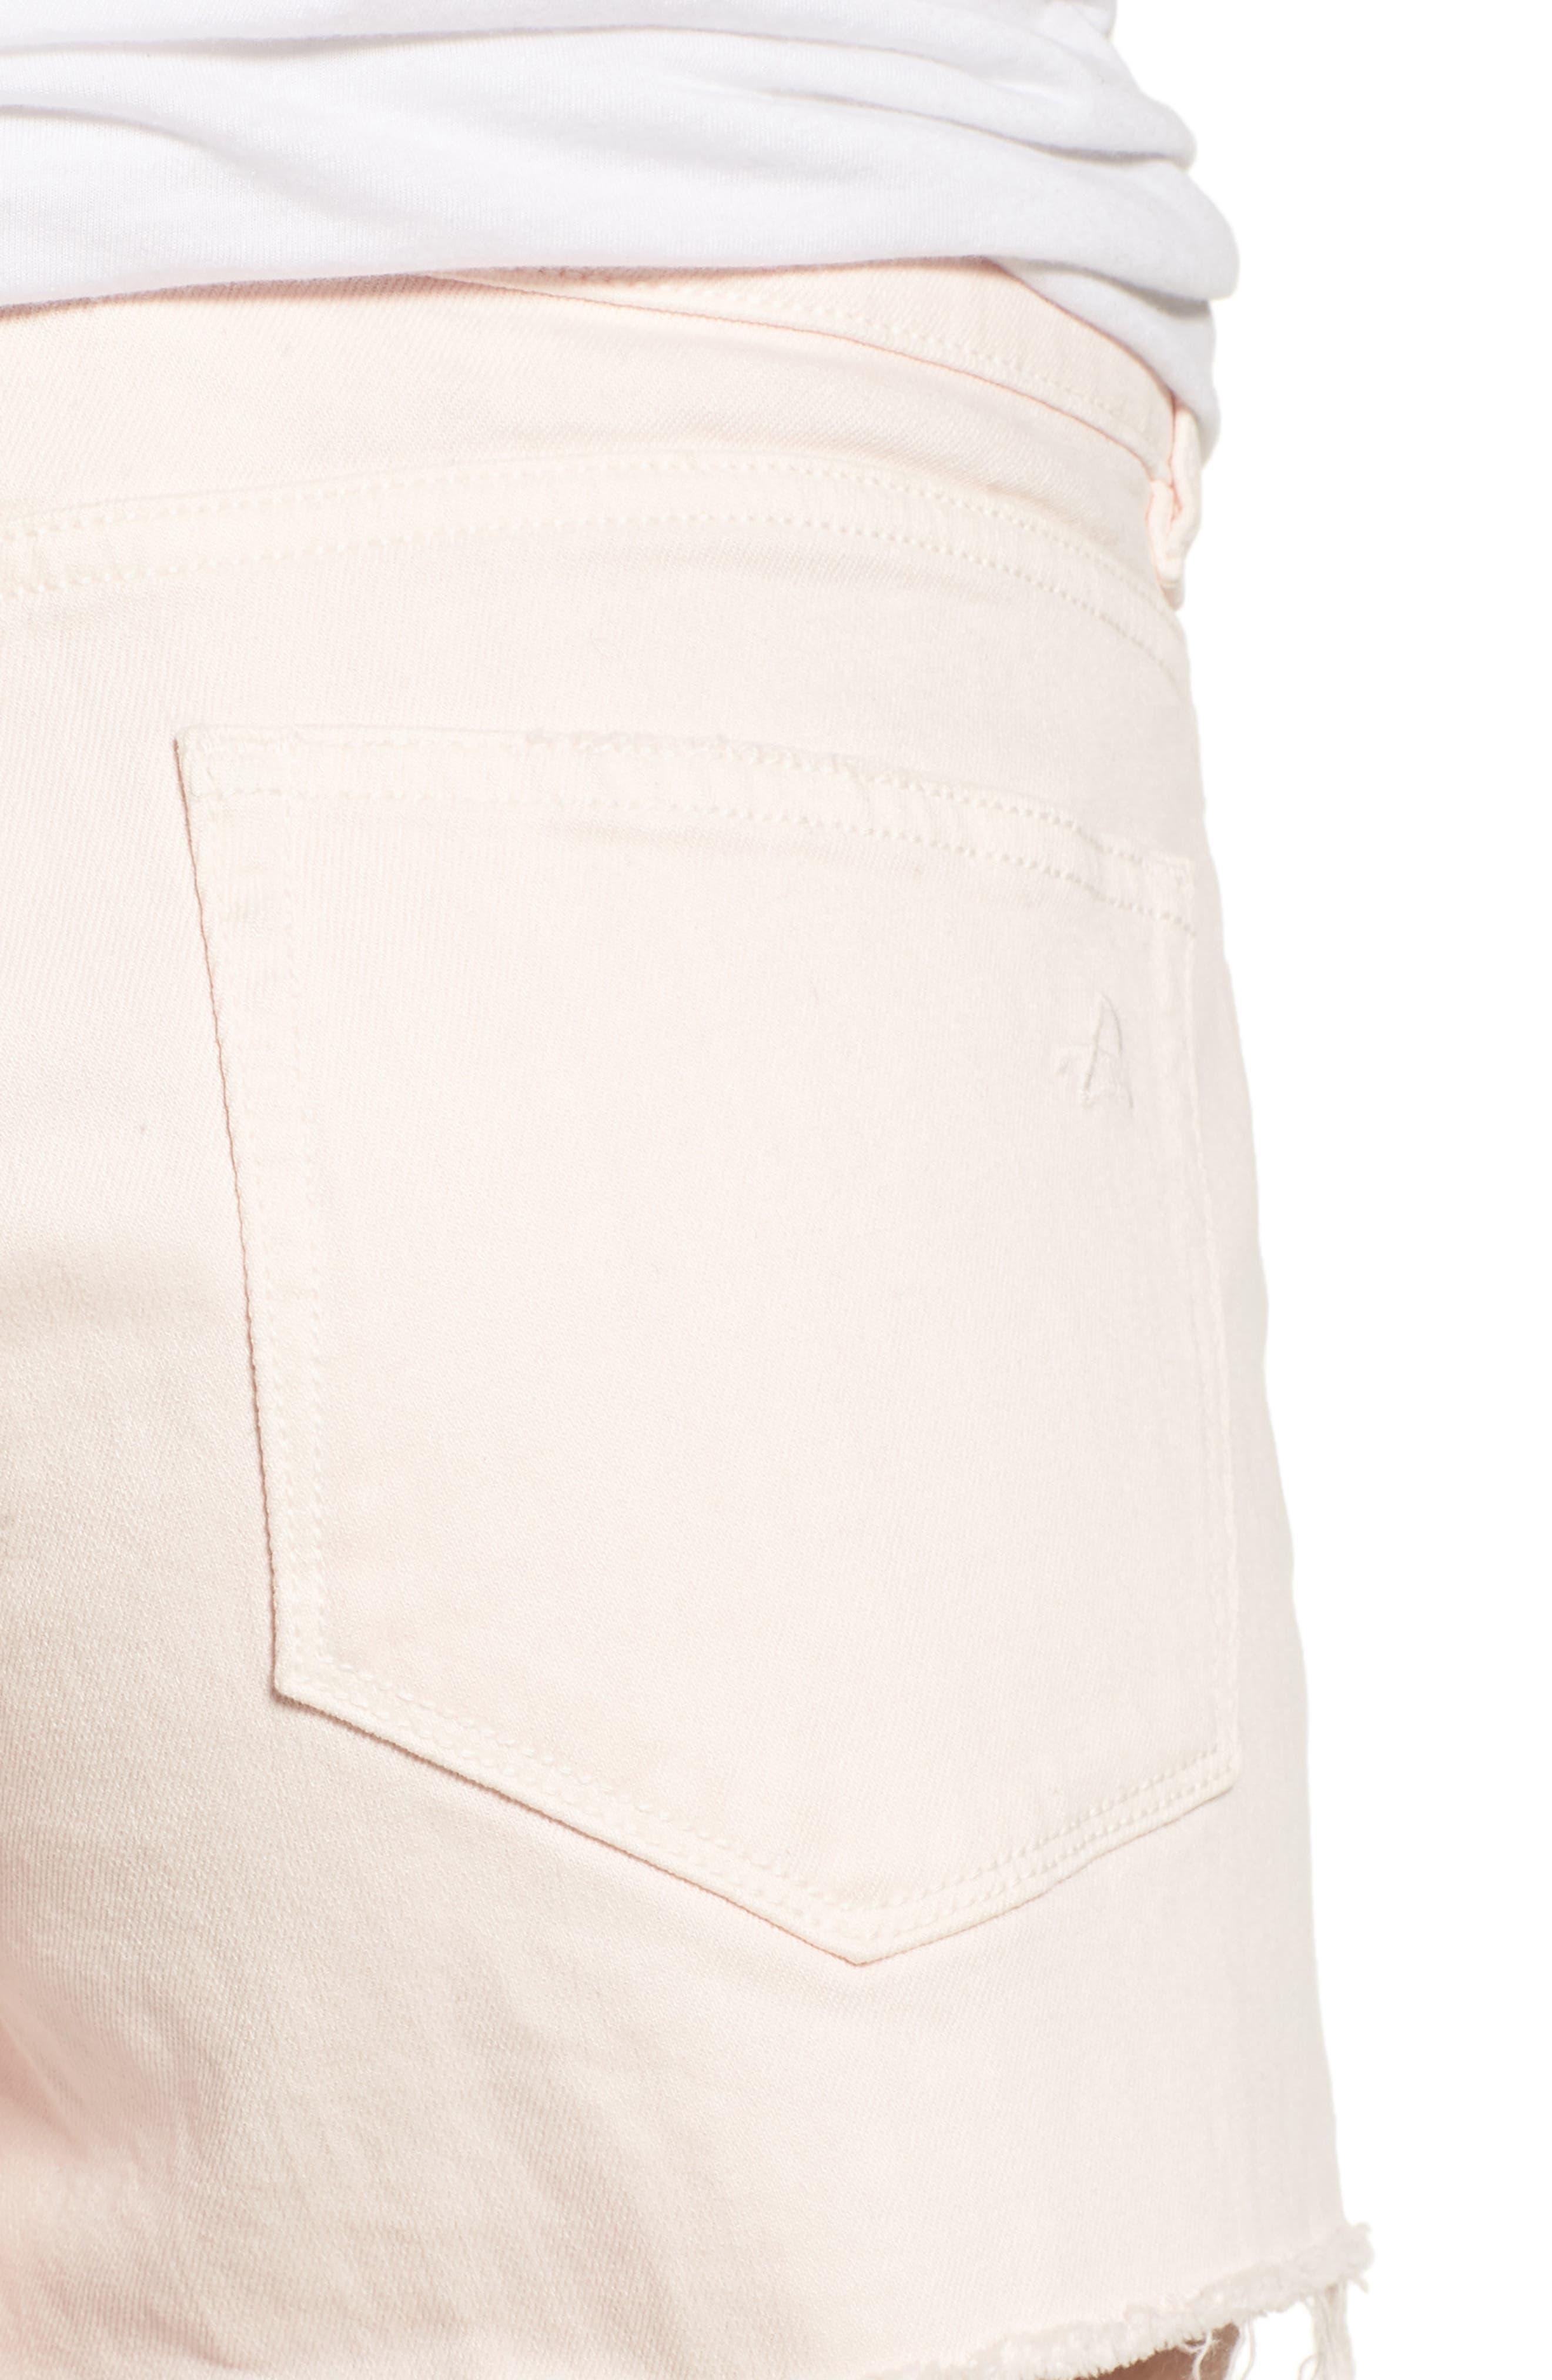 Renee Notch Raw Hem Denim Shorts,                             Alternate thumbnail 4, color,                             Blush Pink